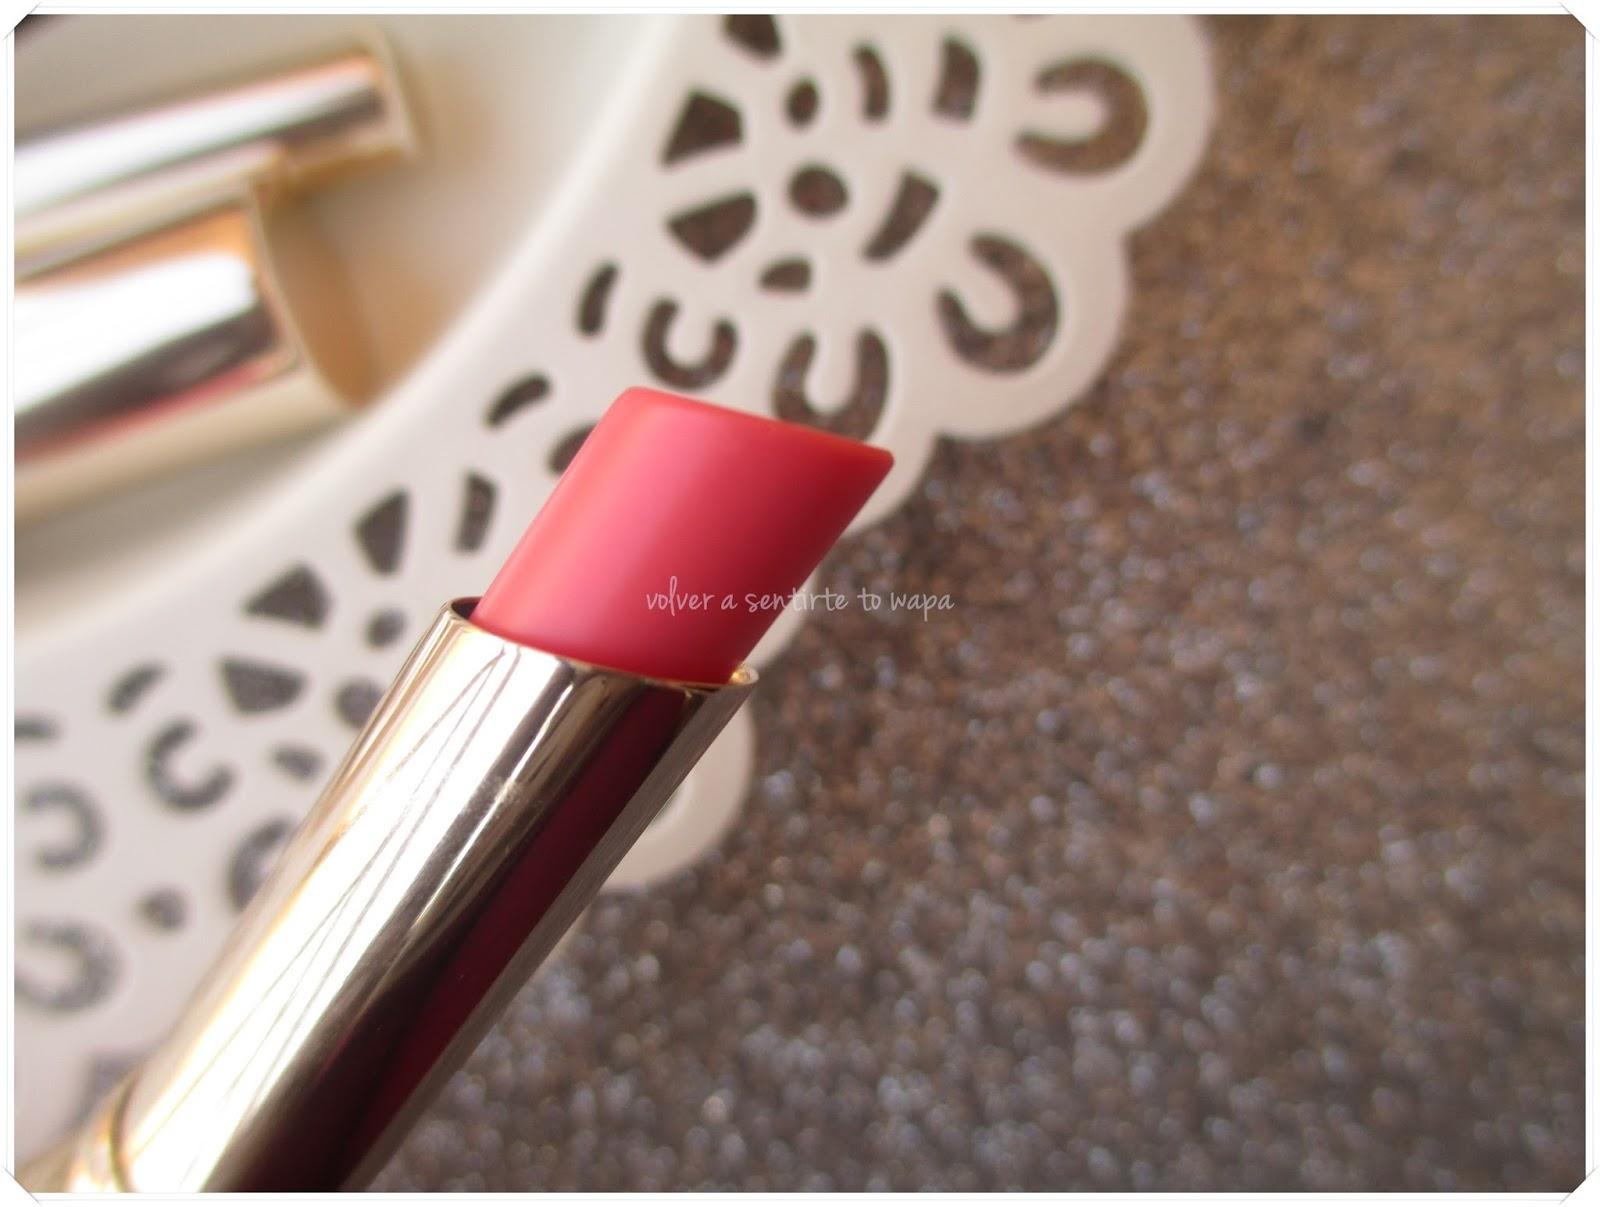 Clarins - Eclat Minute Baume Embellisseur Lèvres - 01 rose